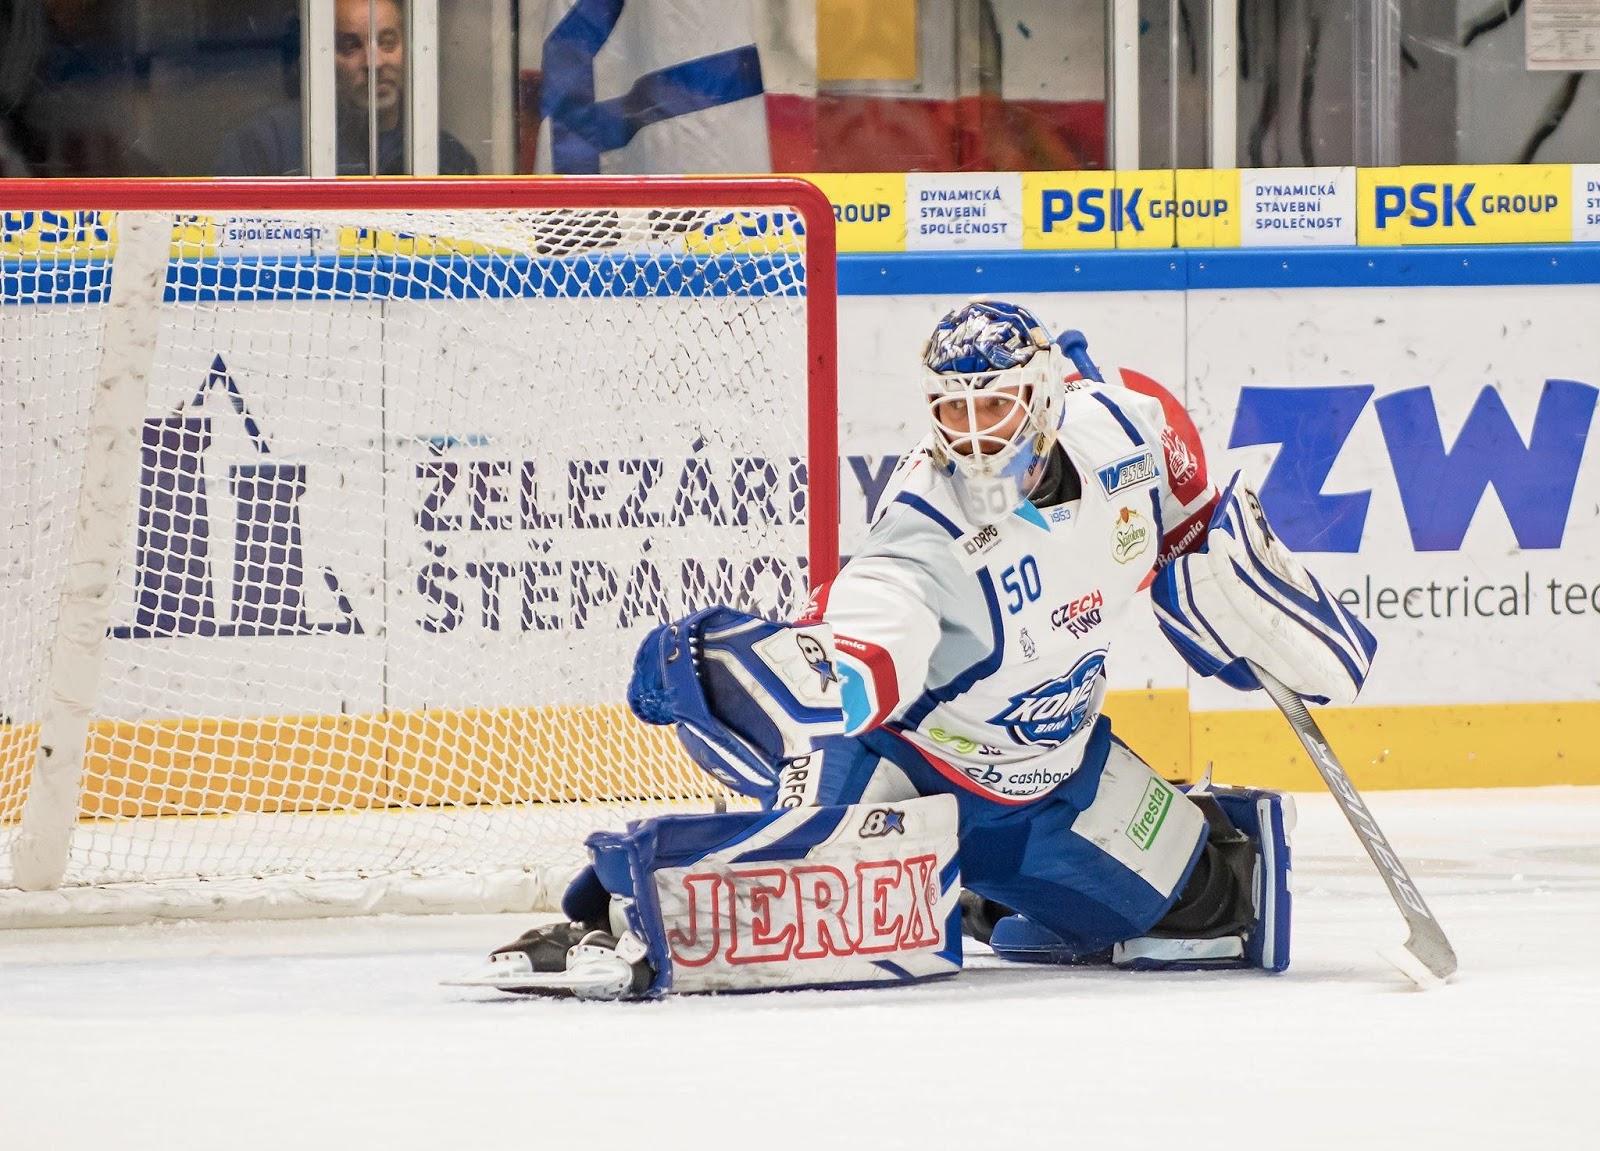 Hokejista Karel Vejmelka. Autor: Jiří Grulich